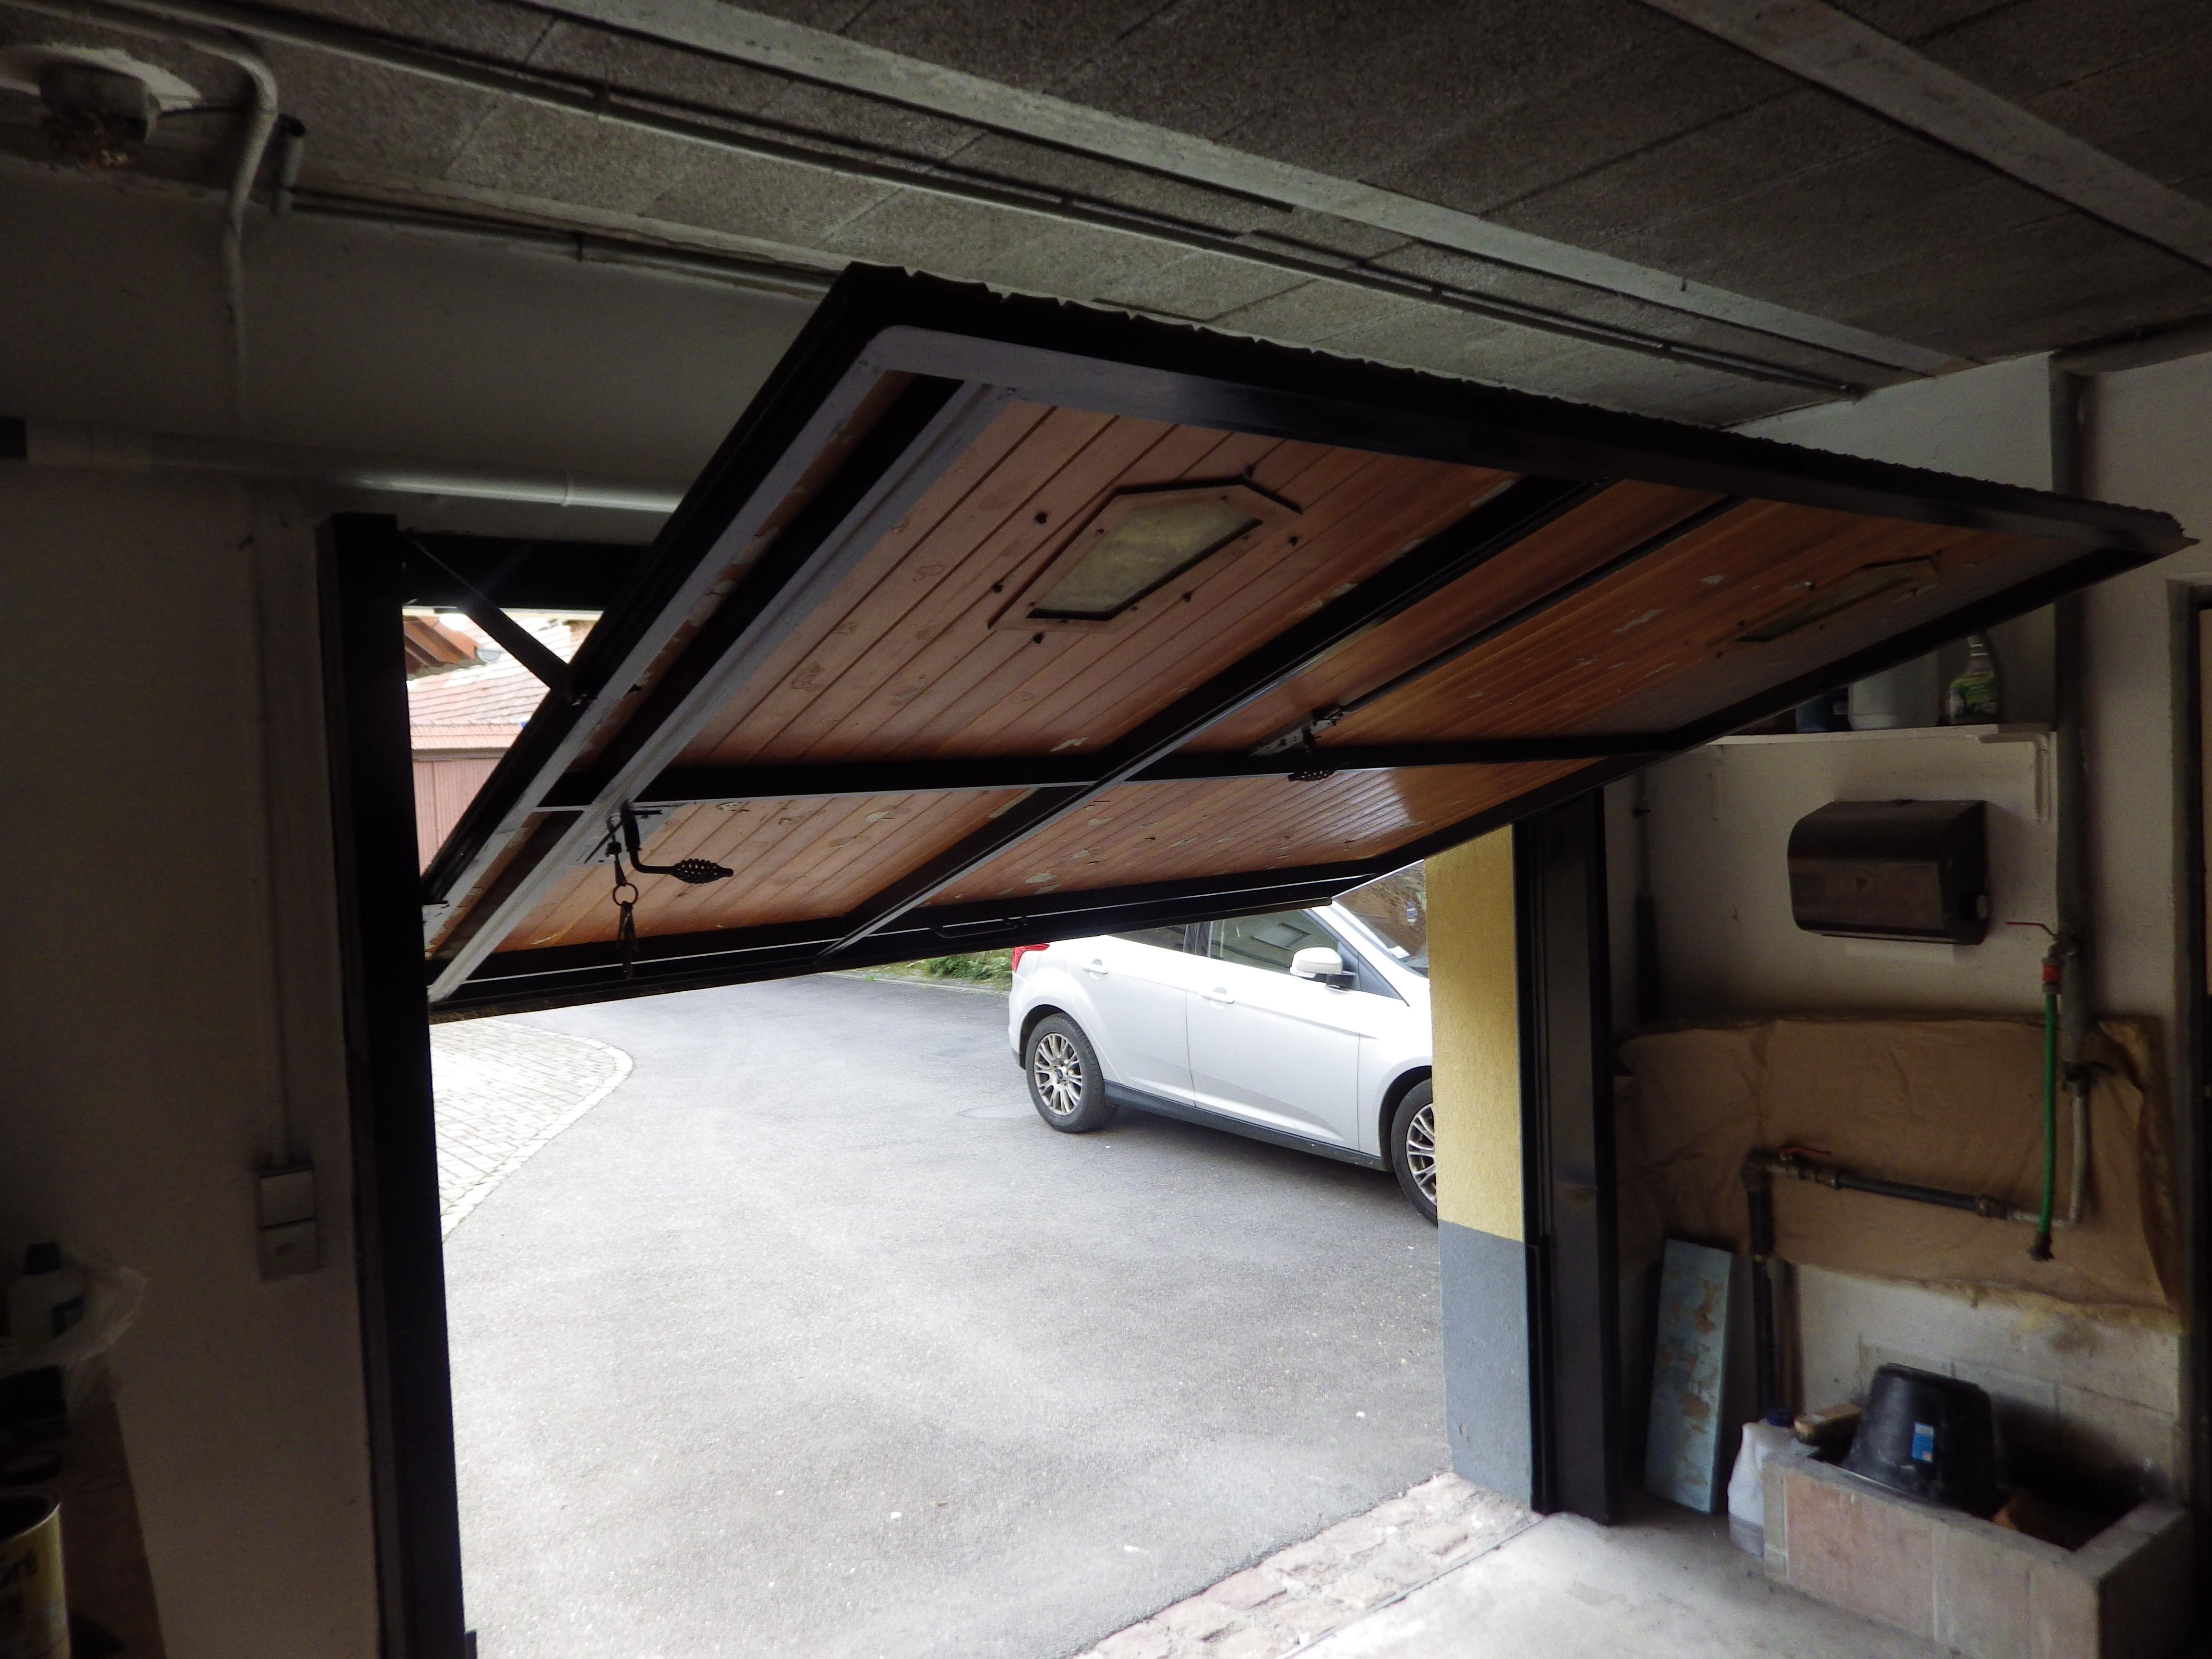 Motorisation Porte De Garage Basculante à Contrepoids Avec Réponses - Motorisation porte de garage basculante